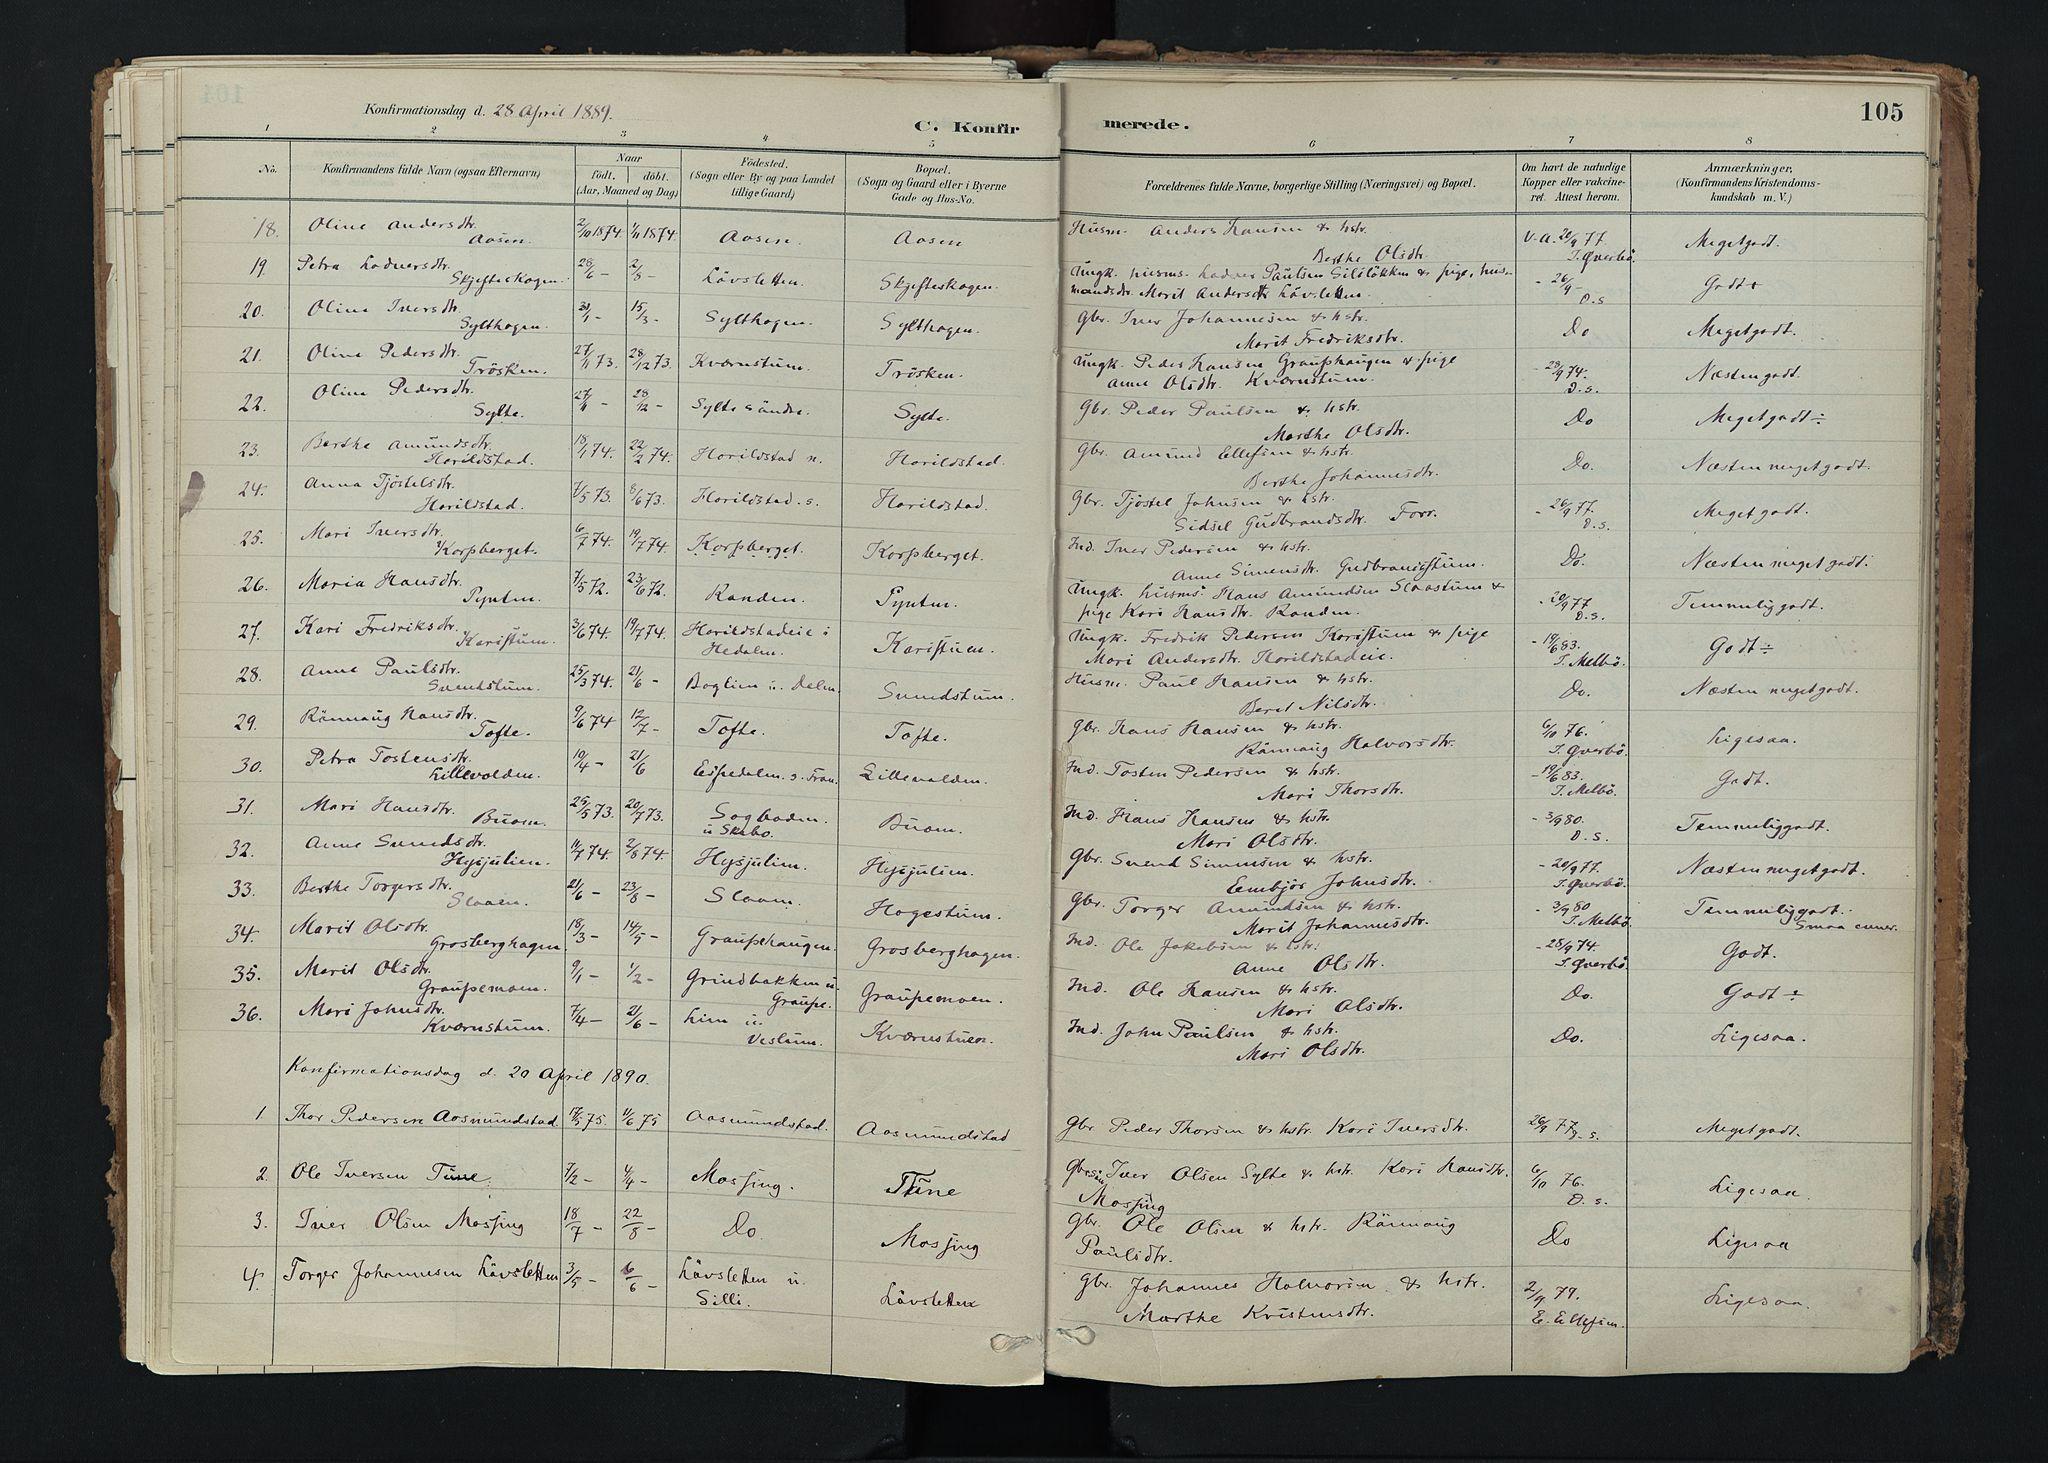 SAH, Nord-Fron prestekontor, Ministerialbok nr. 5, 1884-1914, s. 105